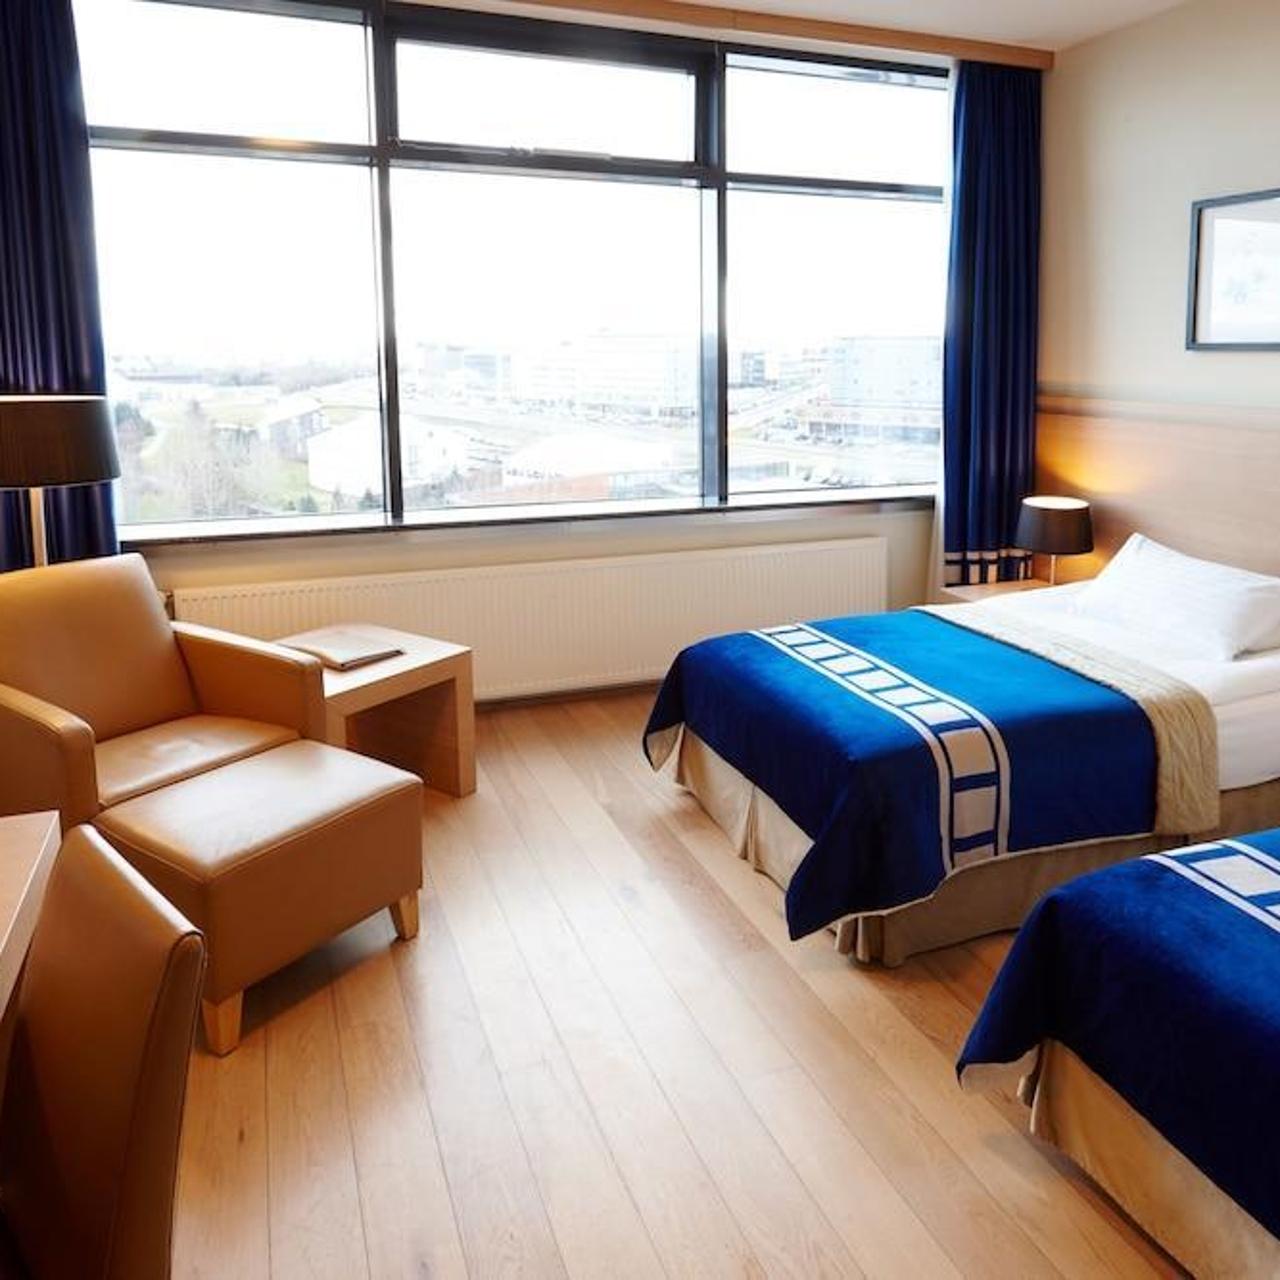 Grand Hotel Reykjavik Reykjavik At Hrs With Free Services